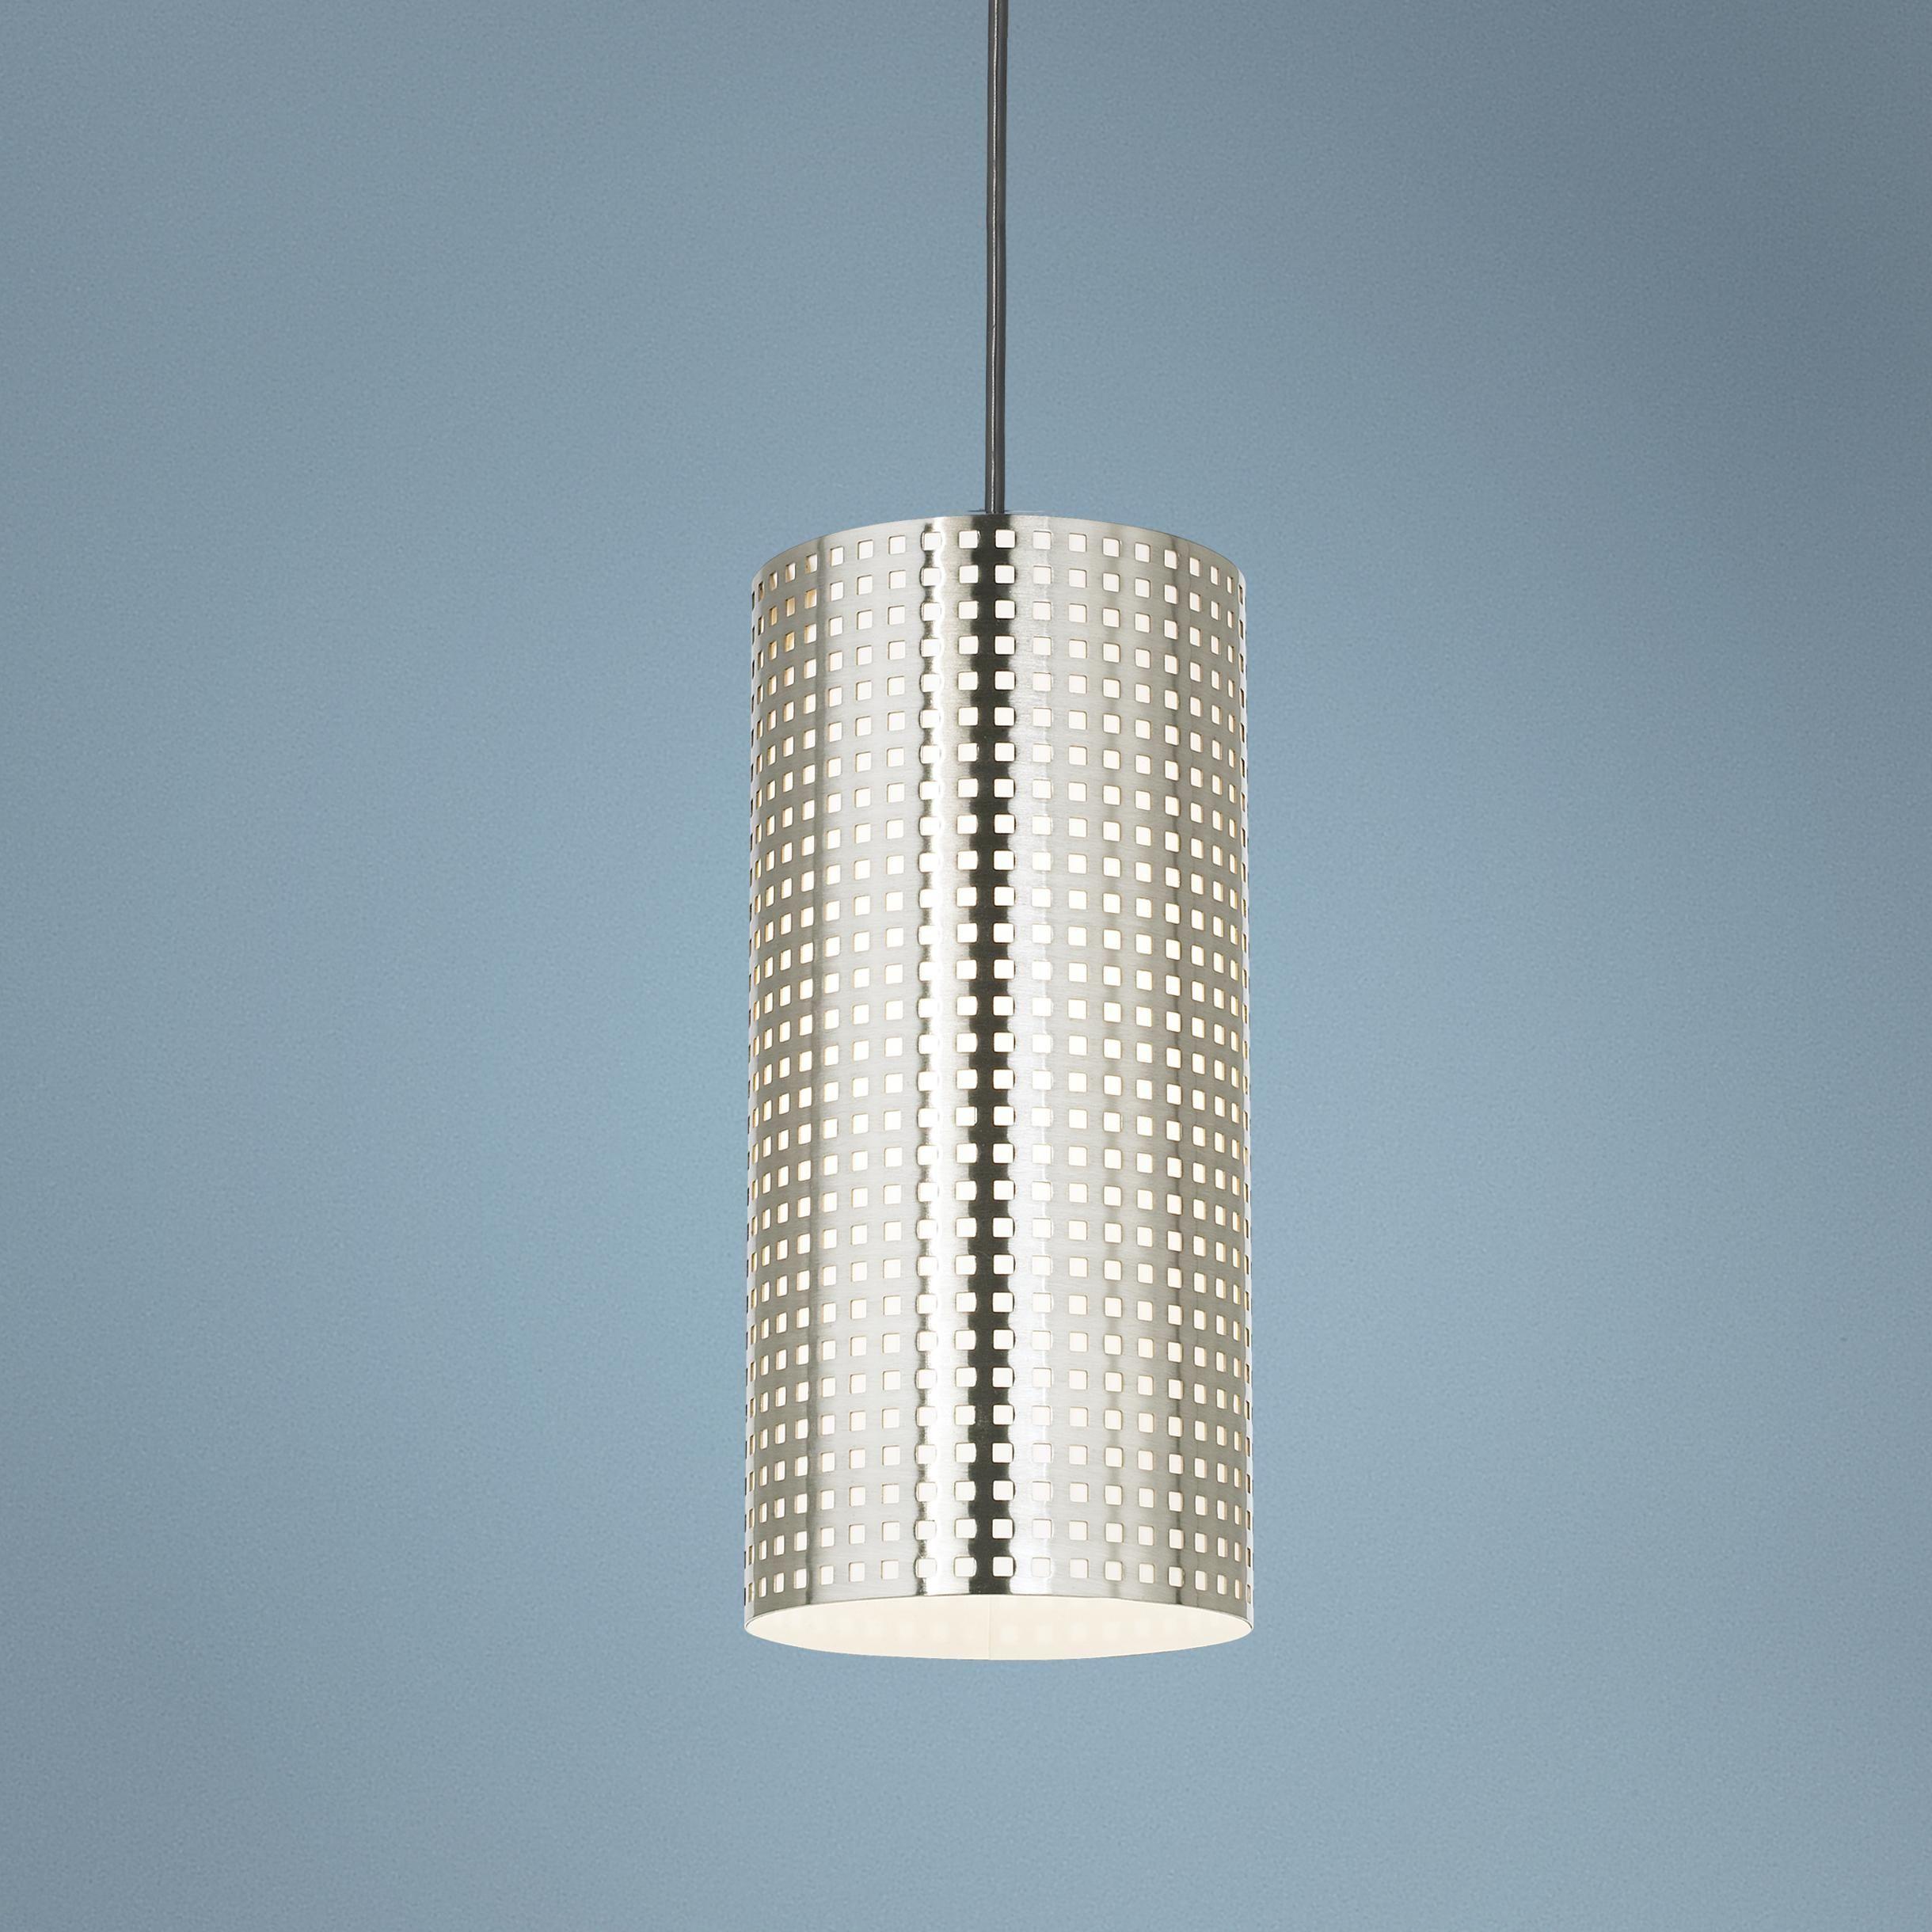 George Kovacs Grid Collection 6 W Perforated Mini Pendant 08843 Lamps Plus Pendant Chandelier Chandelier Design Chandelier Pendant Lights